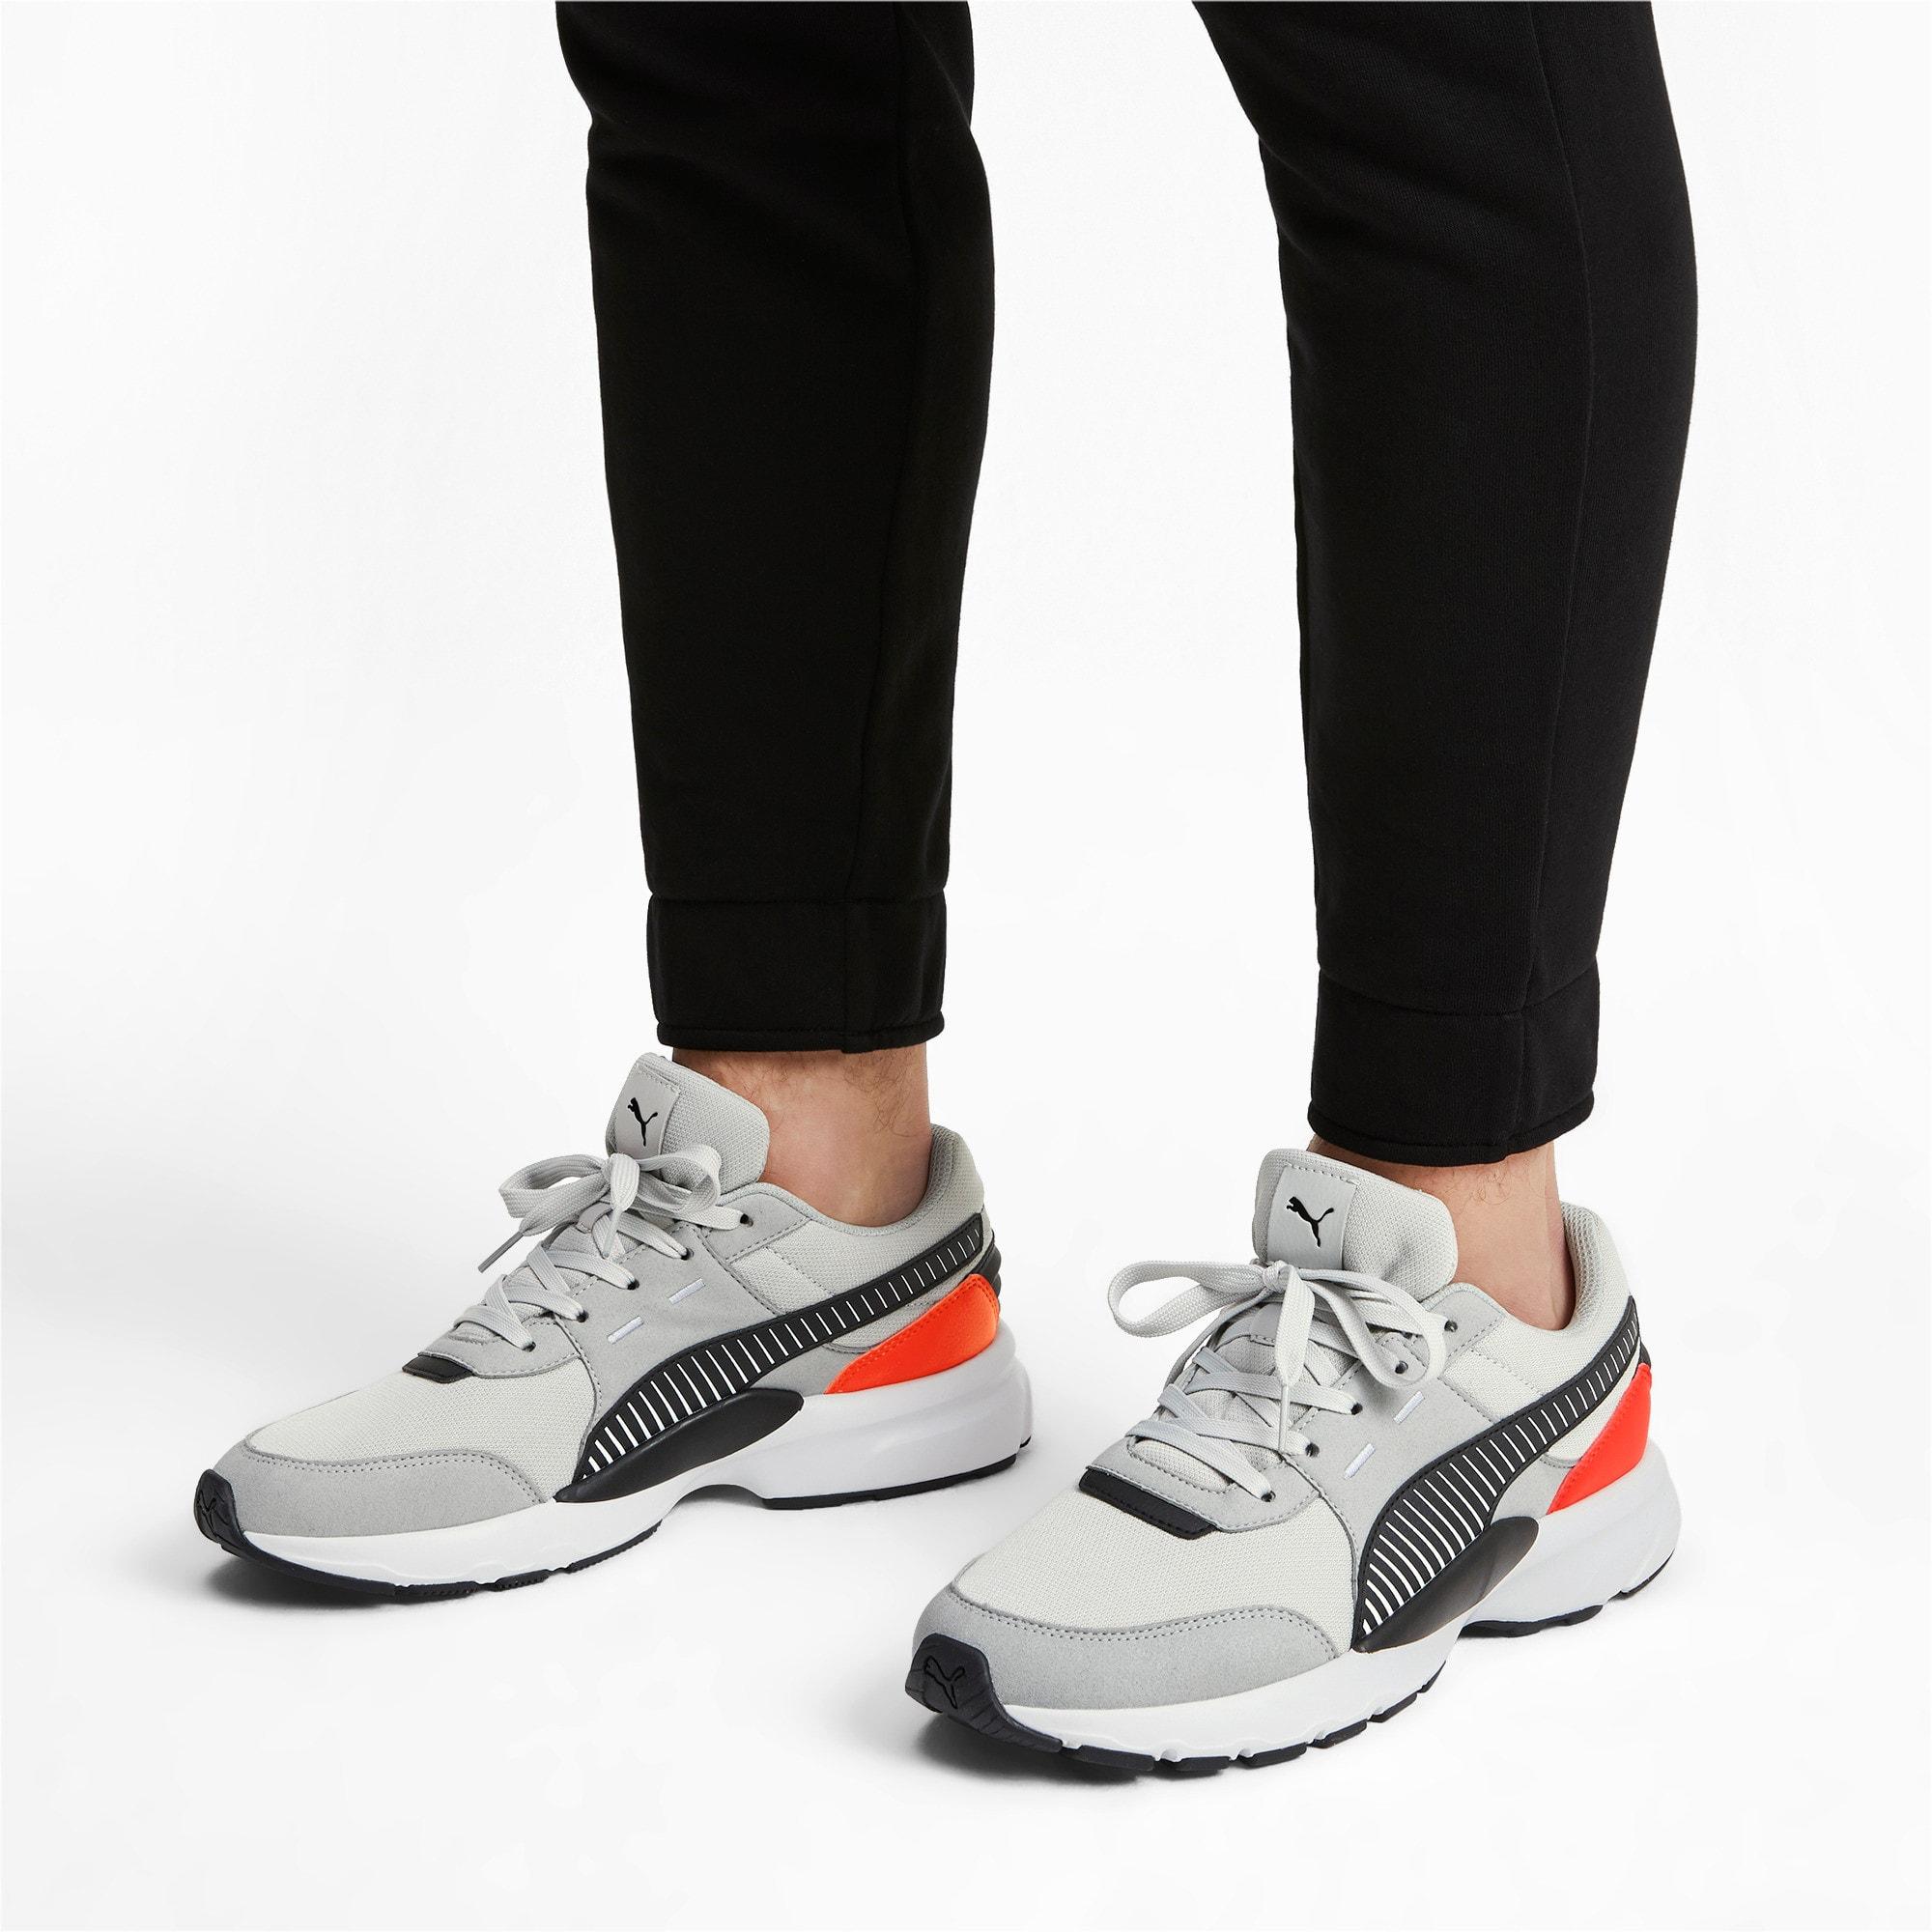 Thumbnail 3 of Future Runner Running Shoes, High Rise-Black-C Tomato-Wht, medium-IND